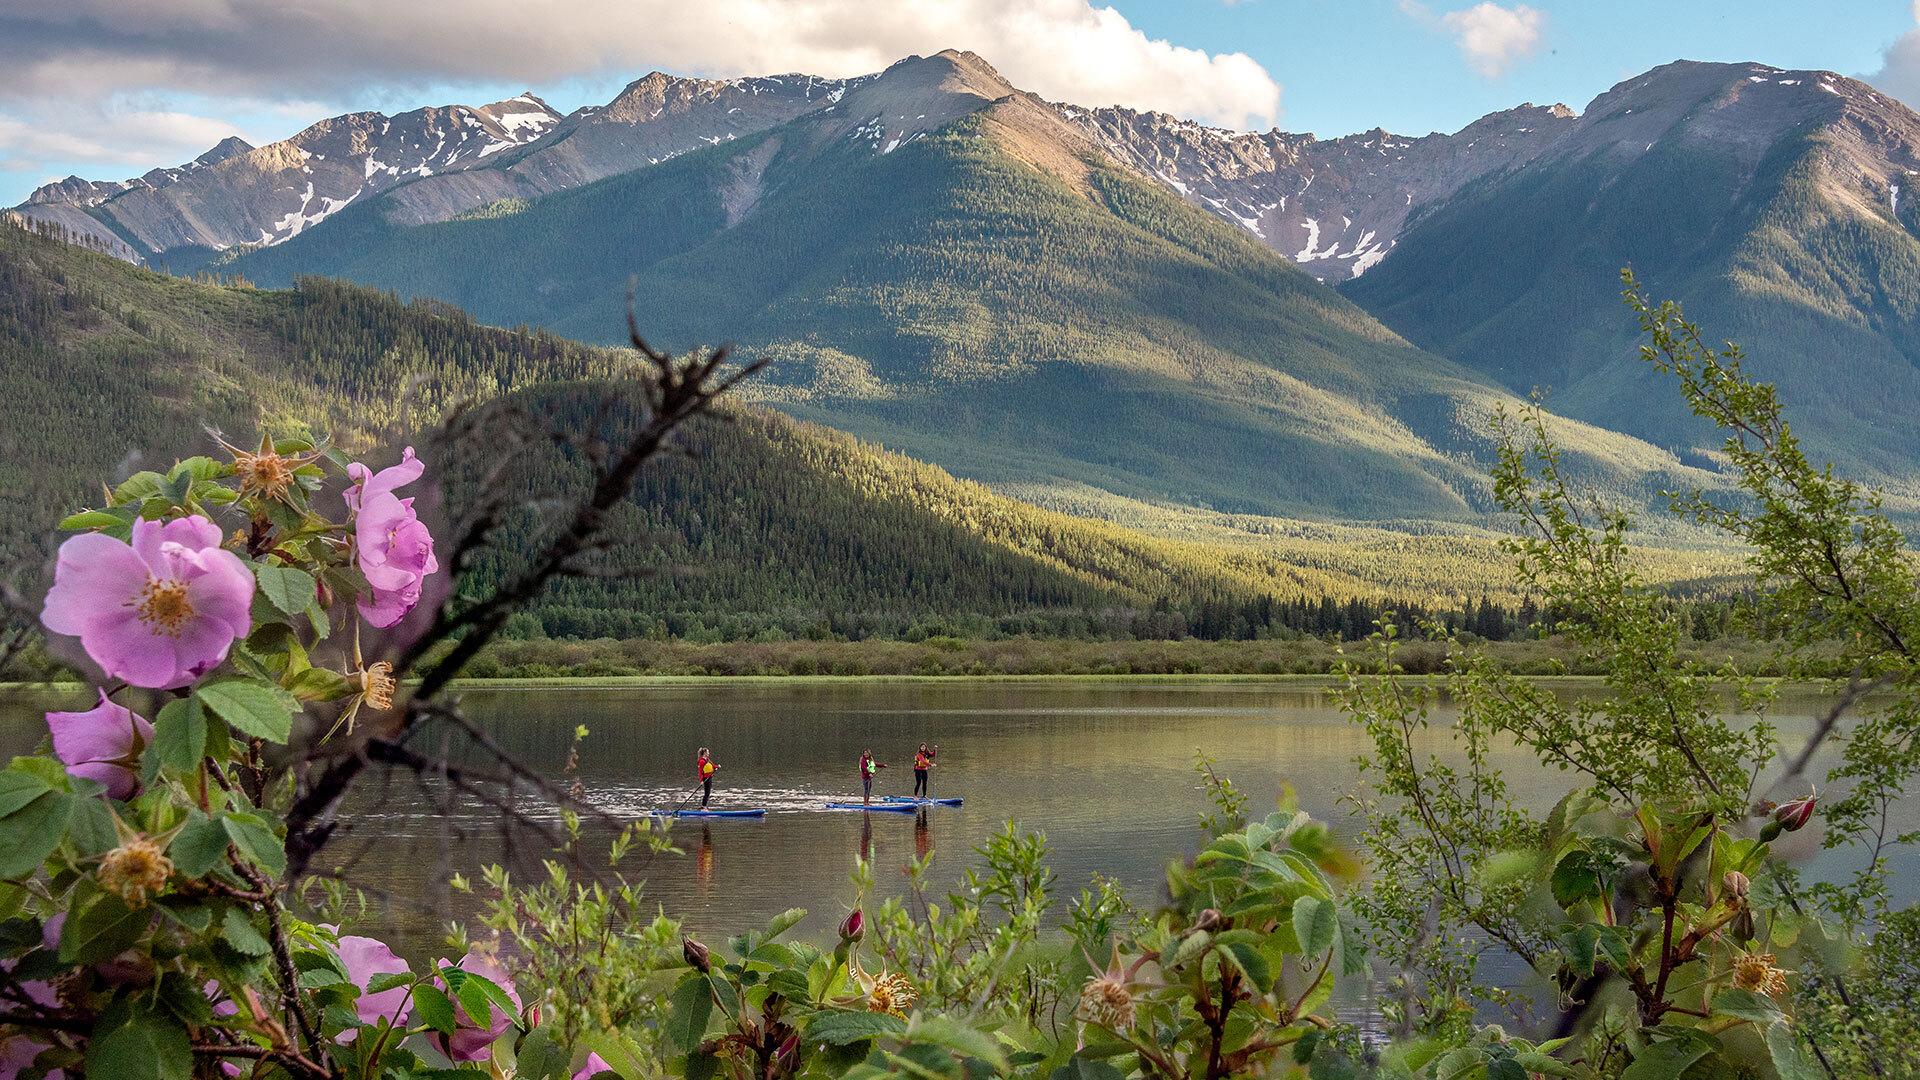 Paddleboarding in Banff National Park